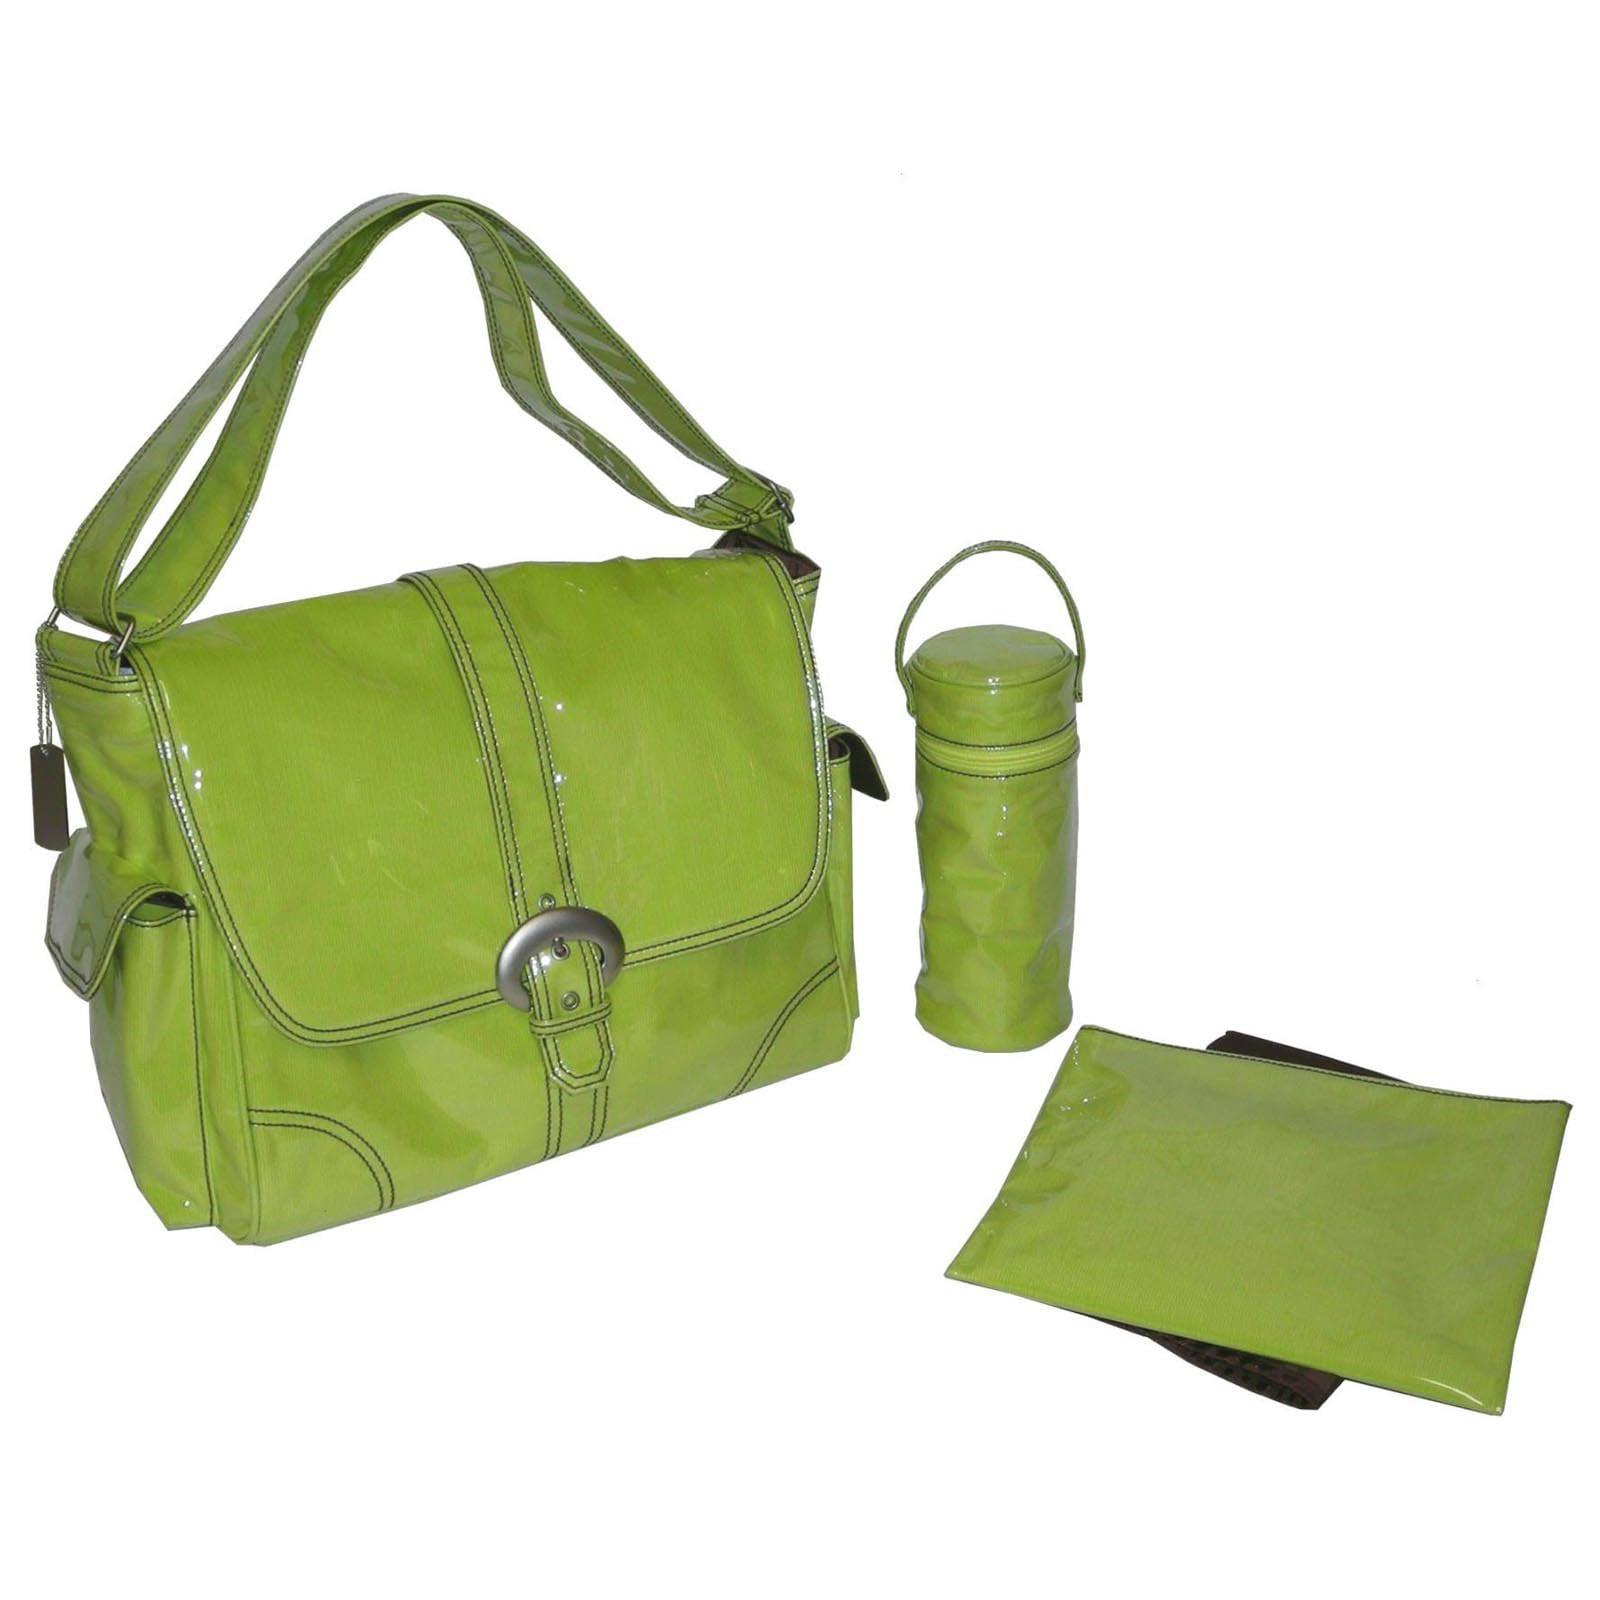 Kalencom Diaper Bag-Kiwi Corduroy Buckle